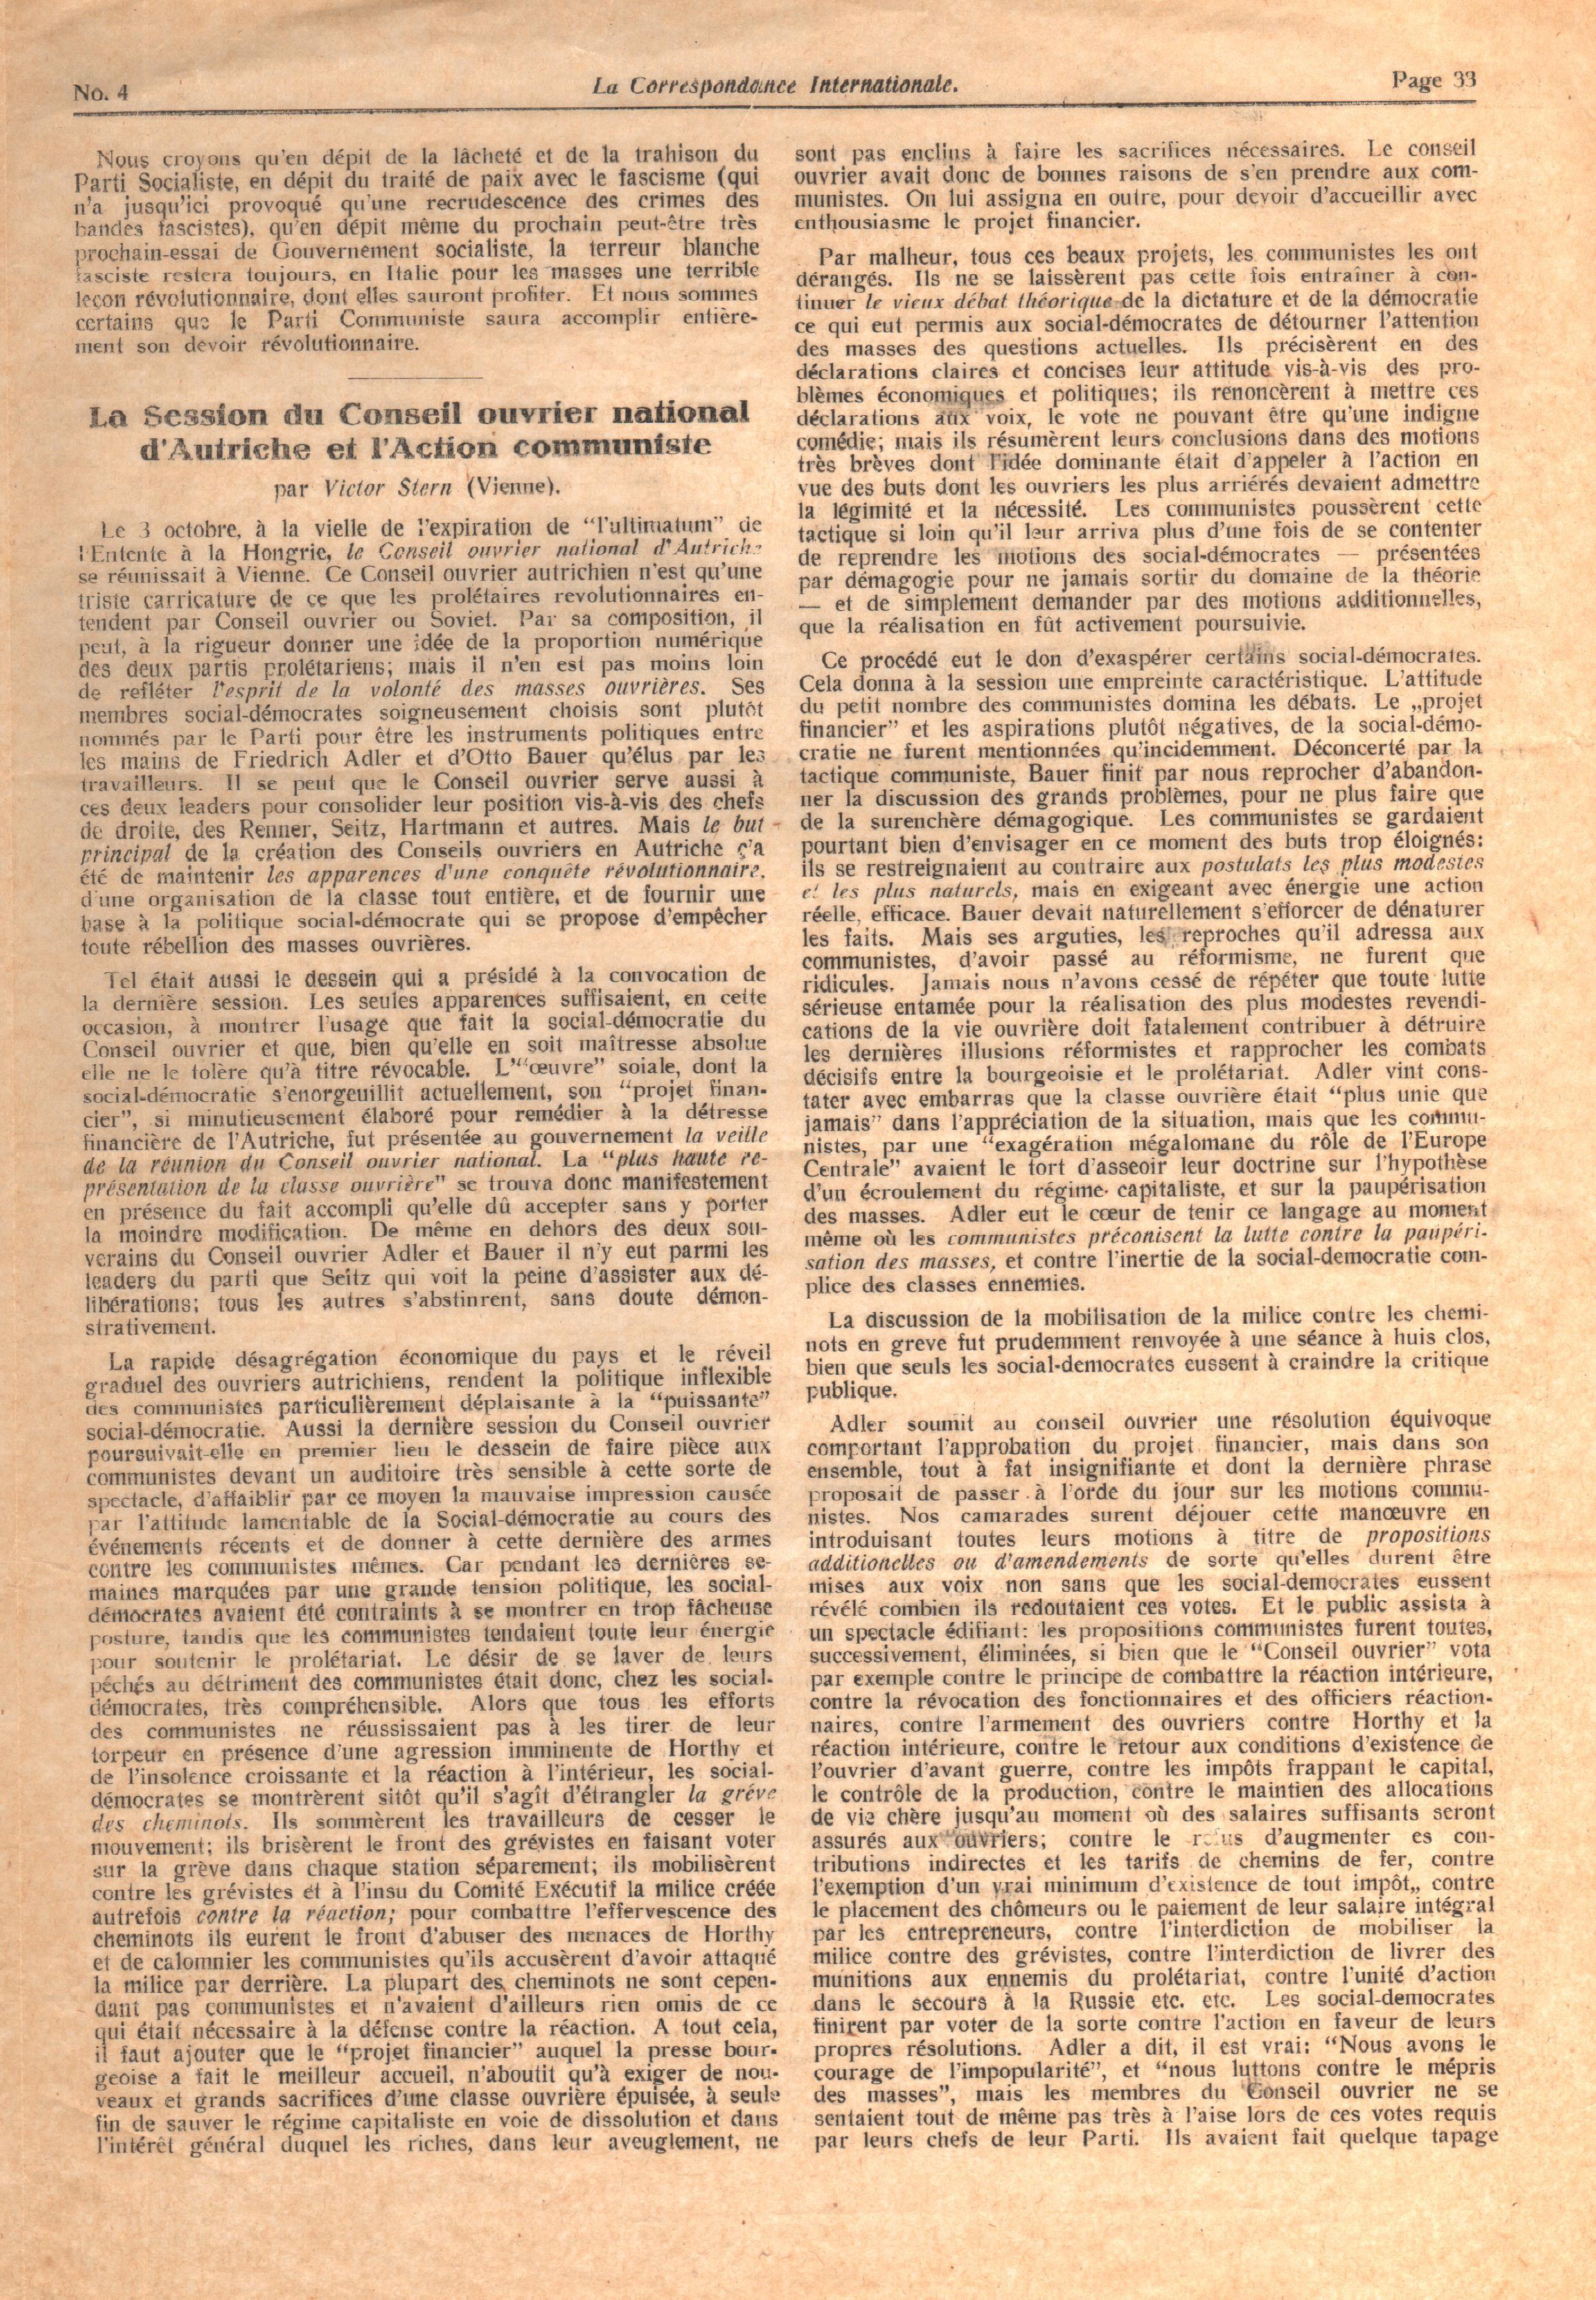 Correspondance Internationale n. 4 - pag. 5